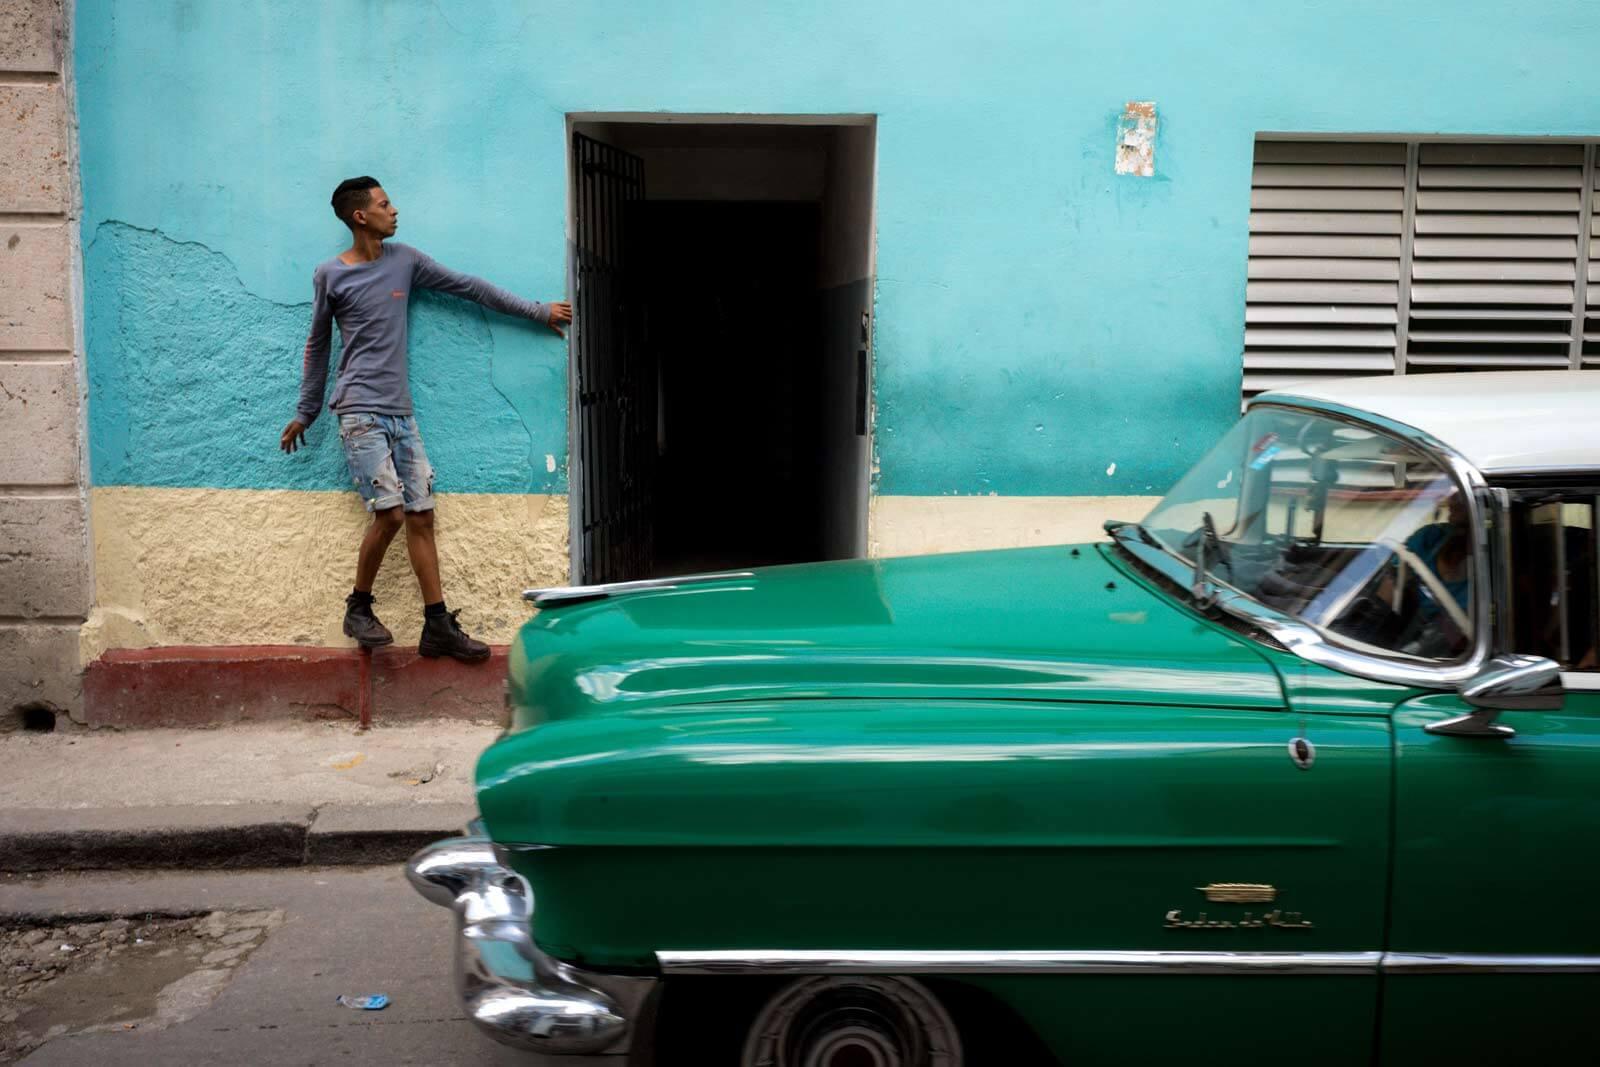 photography-portfolio-Havana-2017-travel-documentary-contrast-culture-vibrant-leica-m10-digital-rangefinder-summicron-35mm-street-photography-cuba-narrow-streets